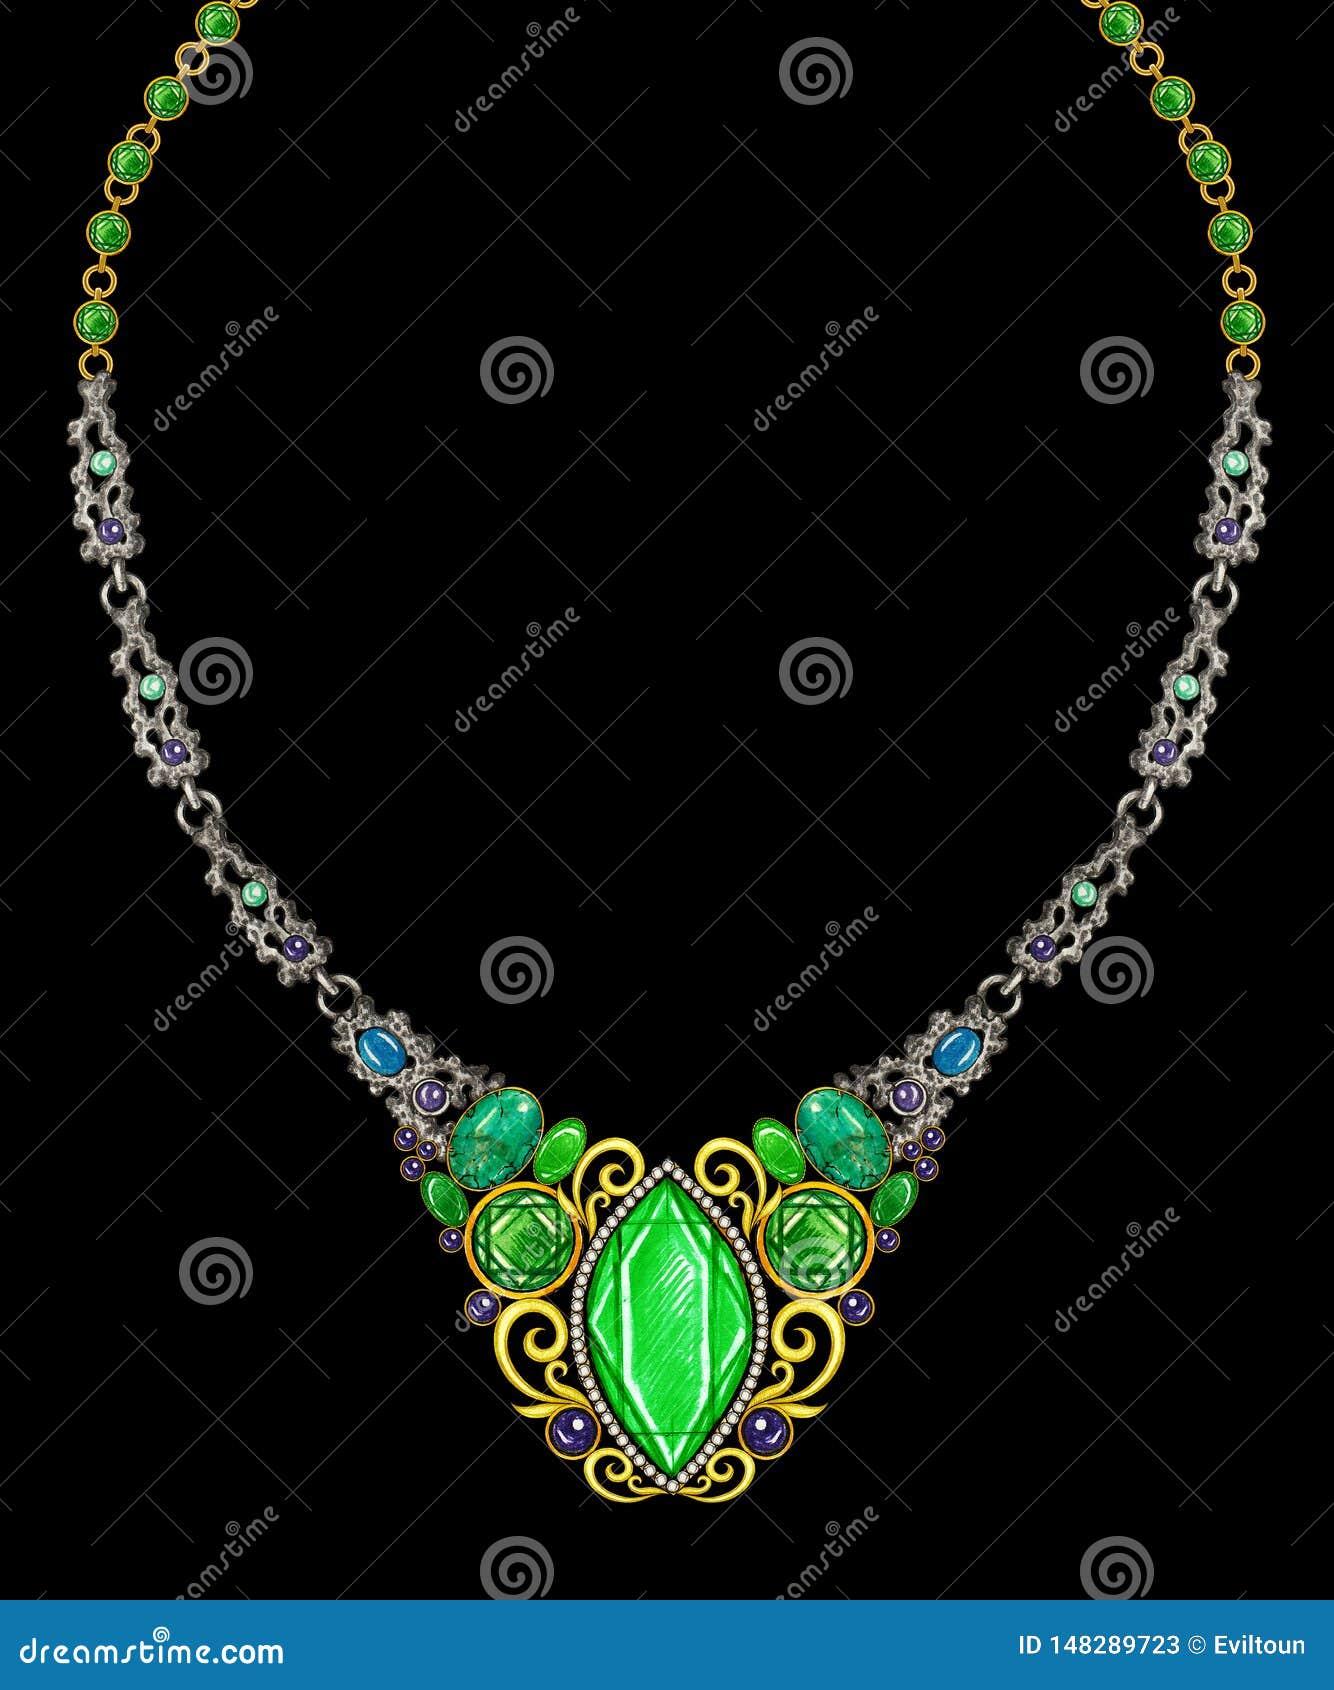 Jewelry Design Art Vintage Necklace.